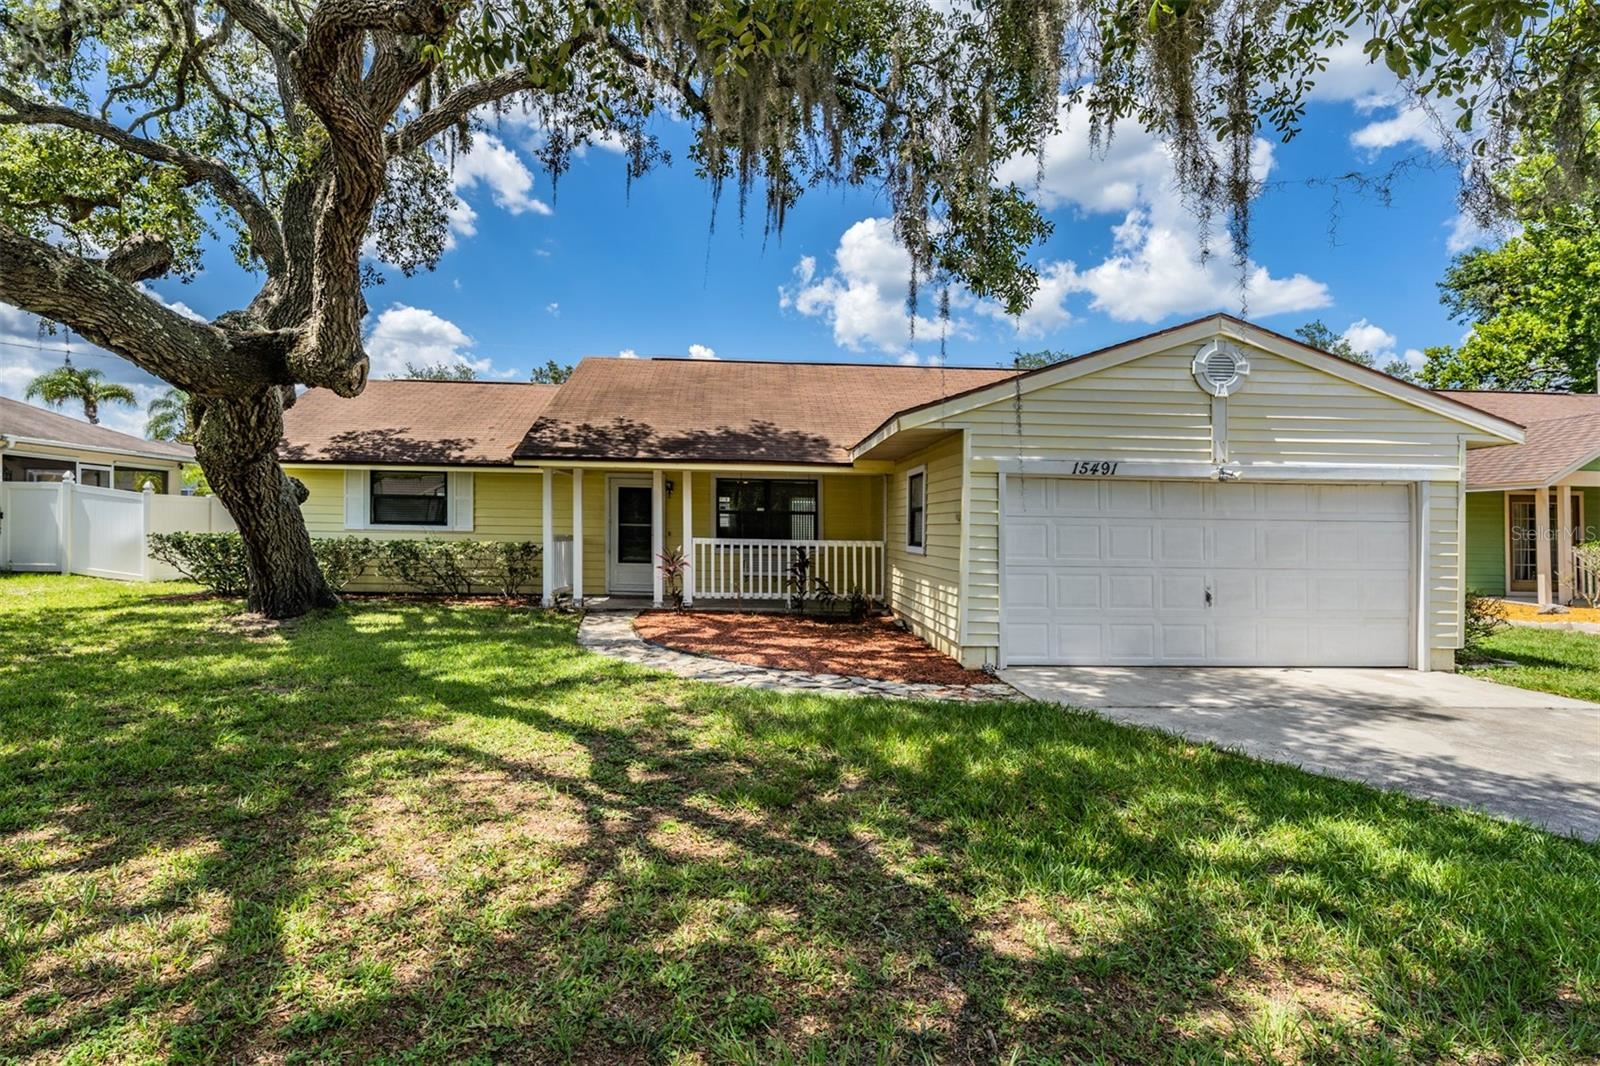 15491 ARVIN DRIVE, Brooksville, FL 34604 - #: U8126077